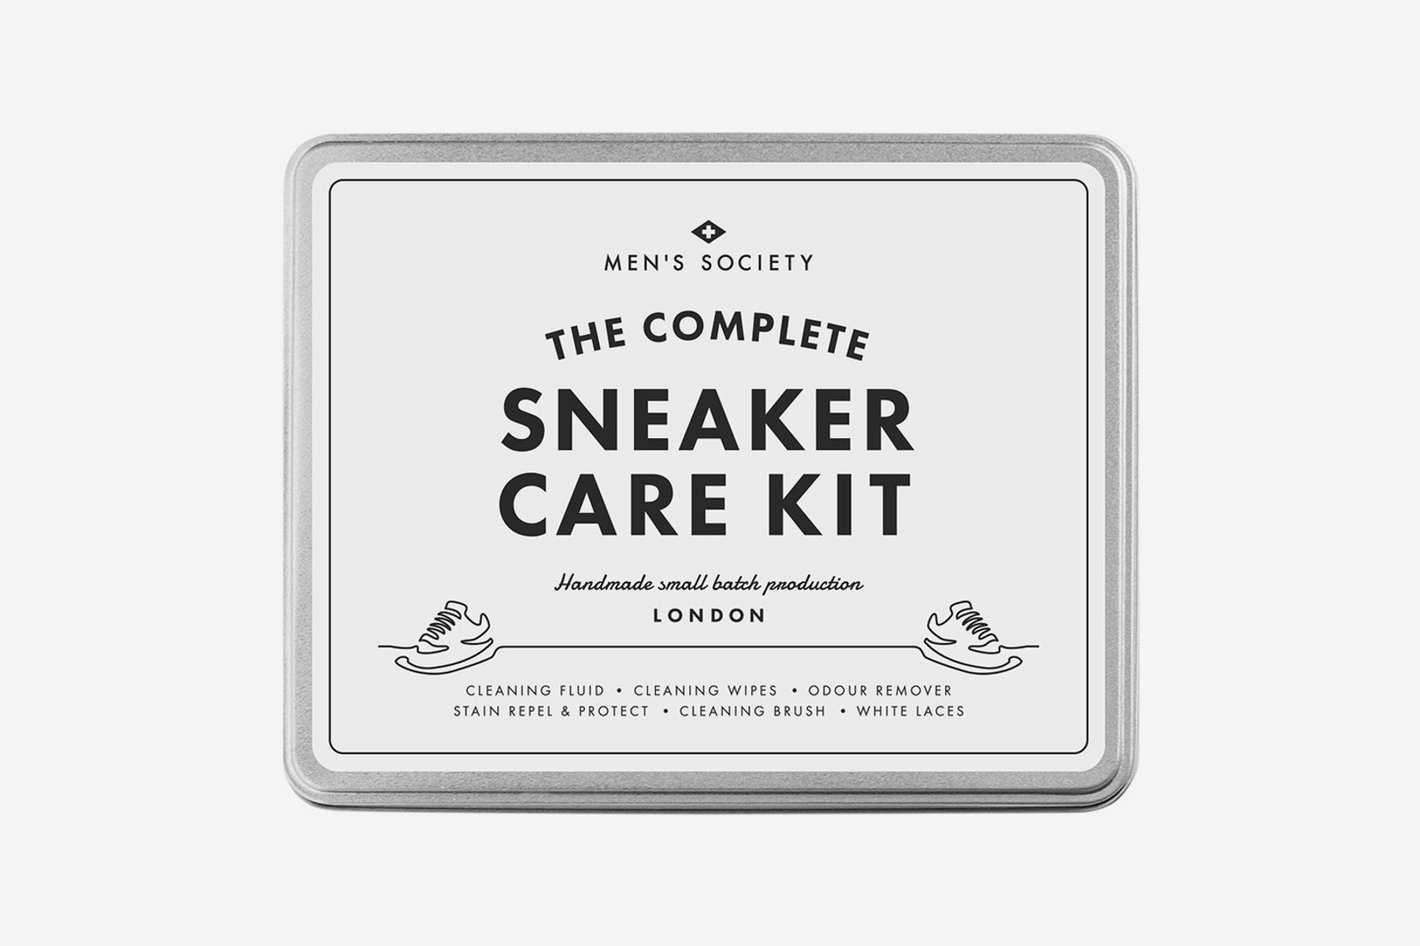 Men's Society Complete Sneaker Care Kit